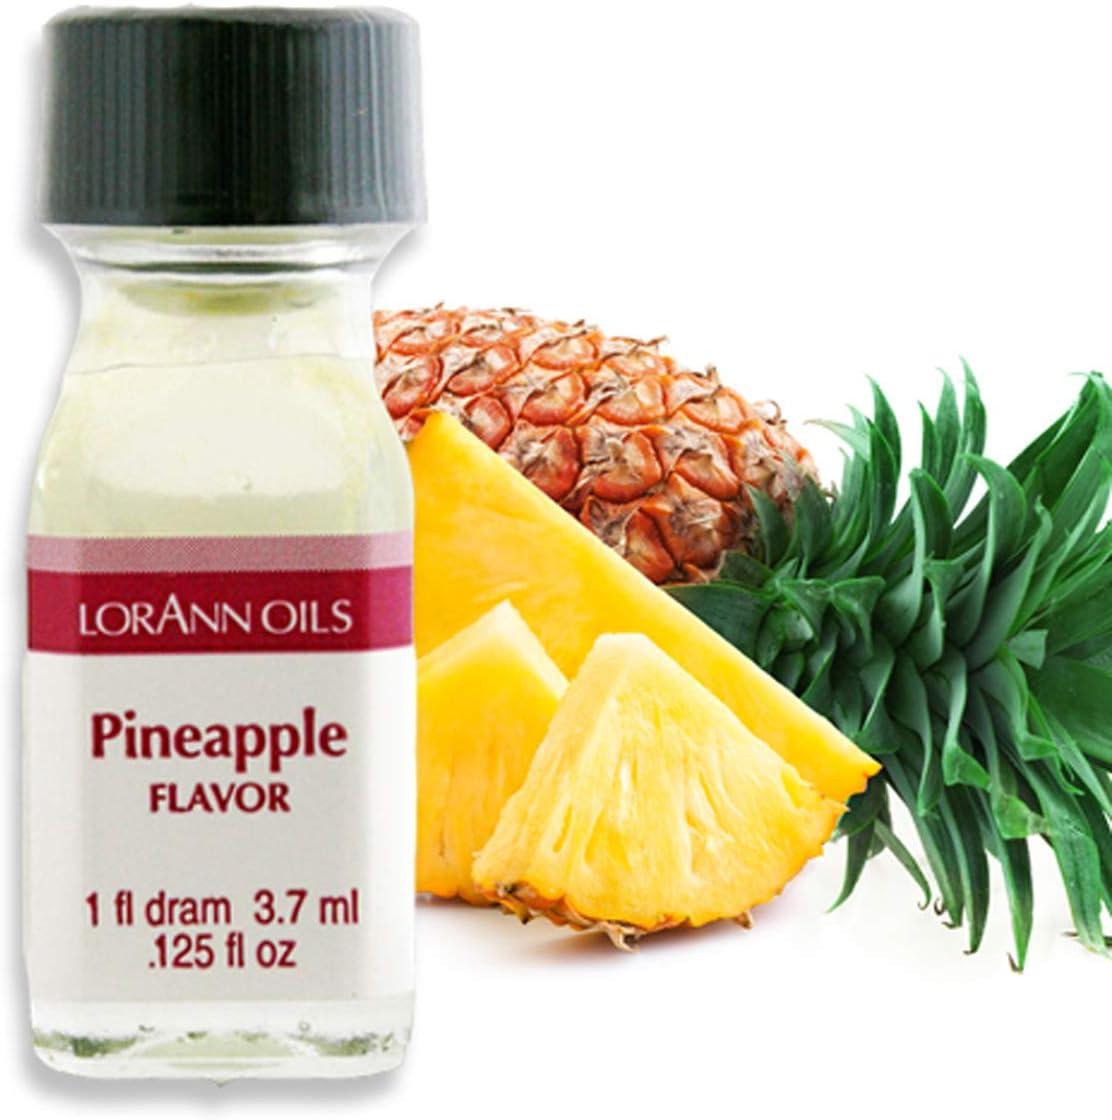 Lorann Oils Pineapple Flavoring, 1 Dram